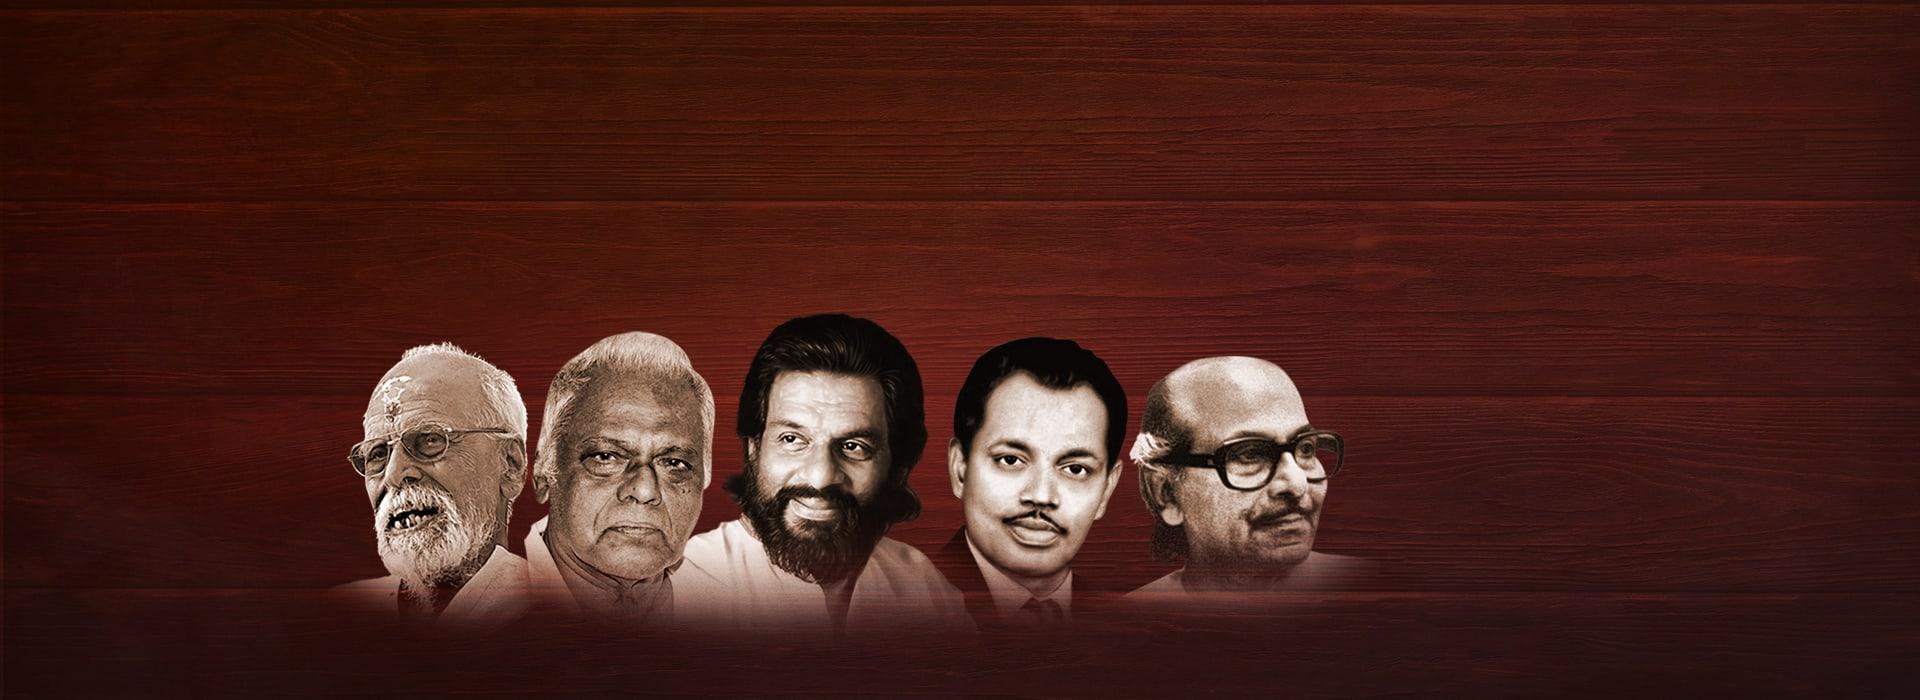 351 superhit retro malayalam songs inside